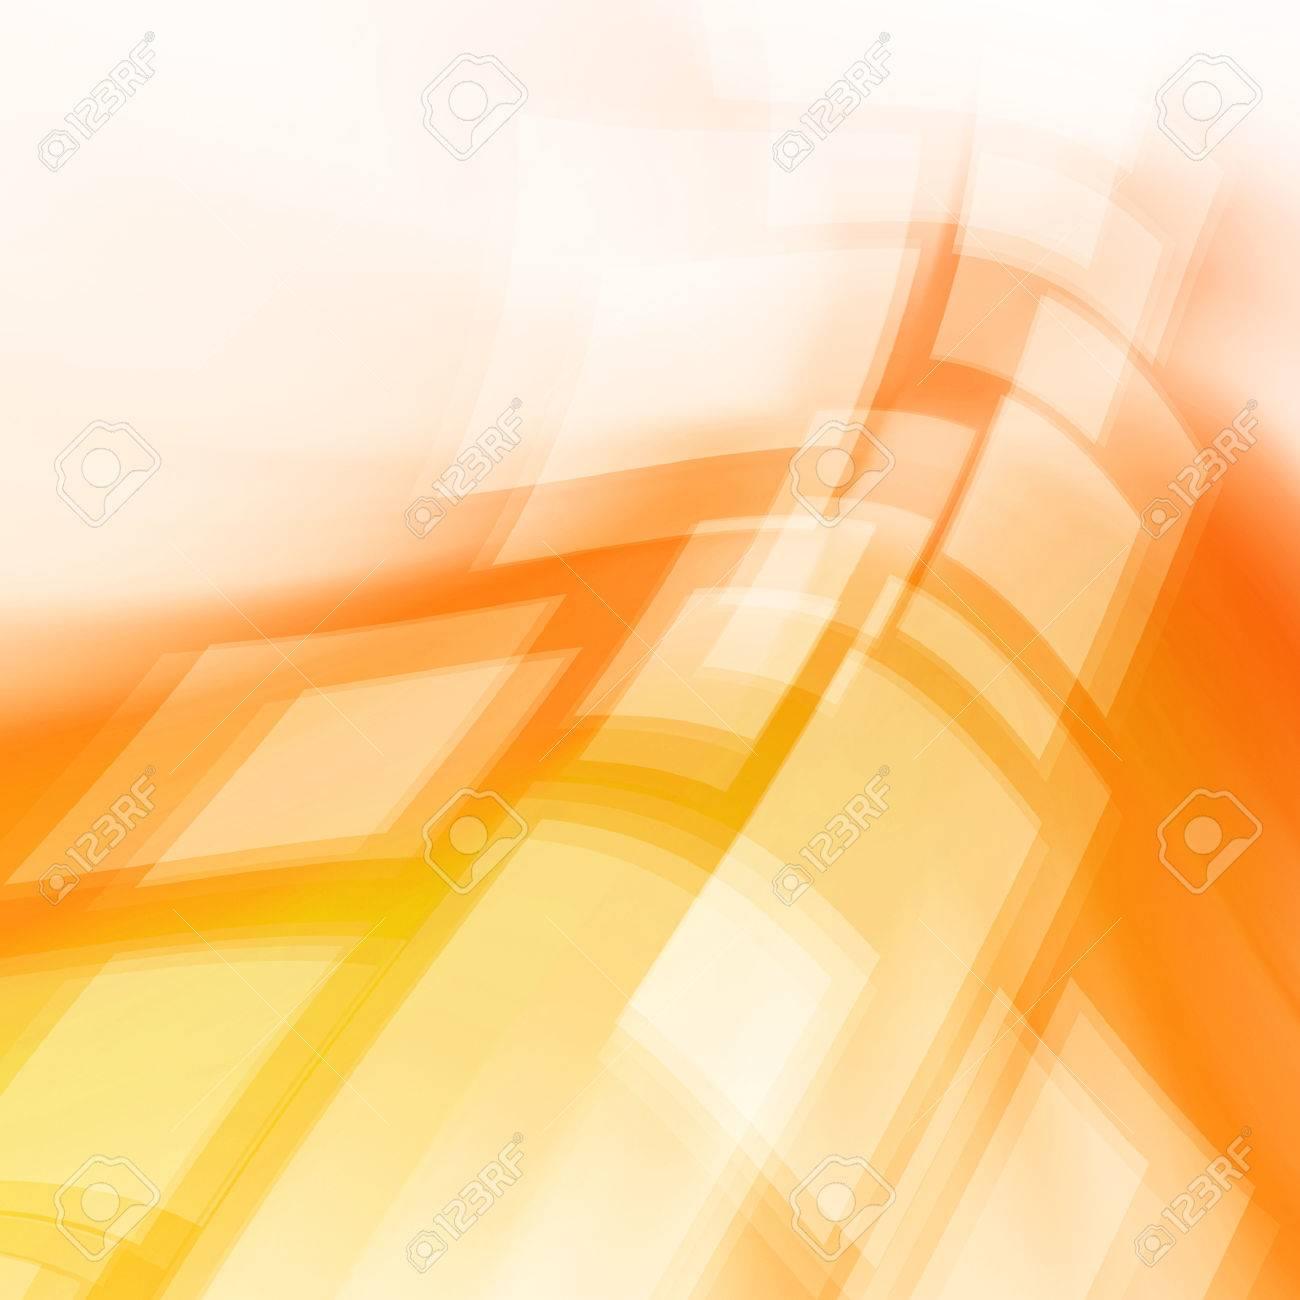 Orange Abstract Dynamic Art Futuristic Background Design - 37175533